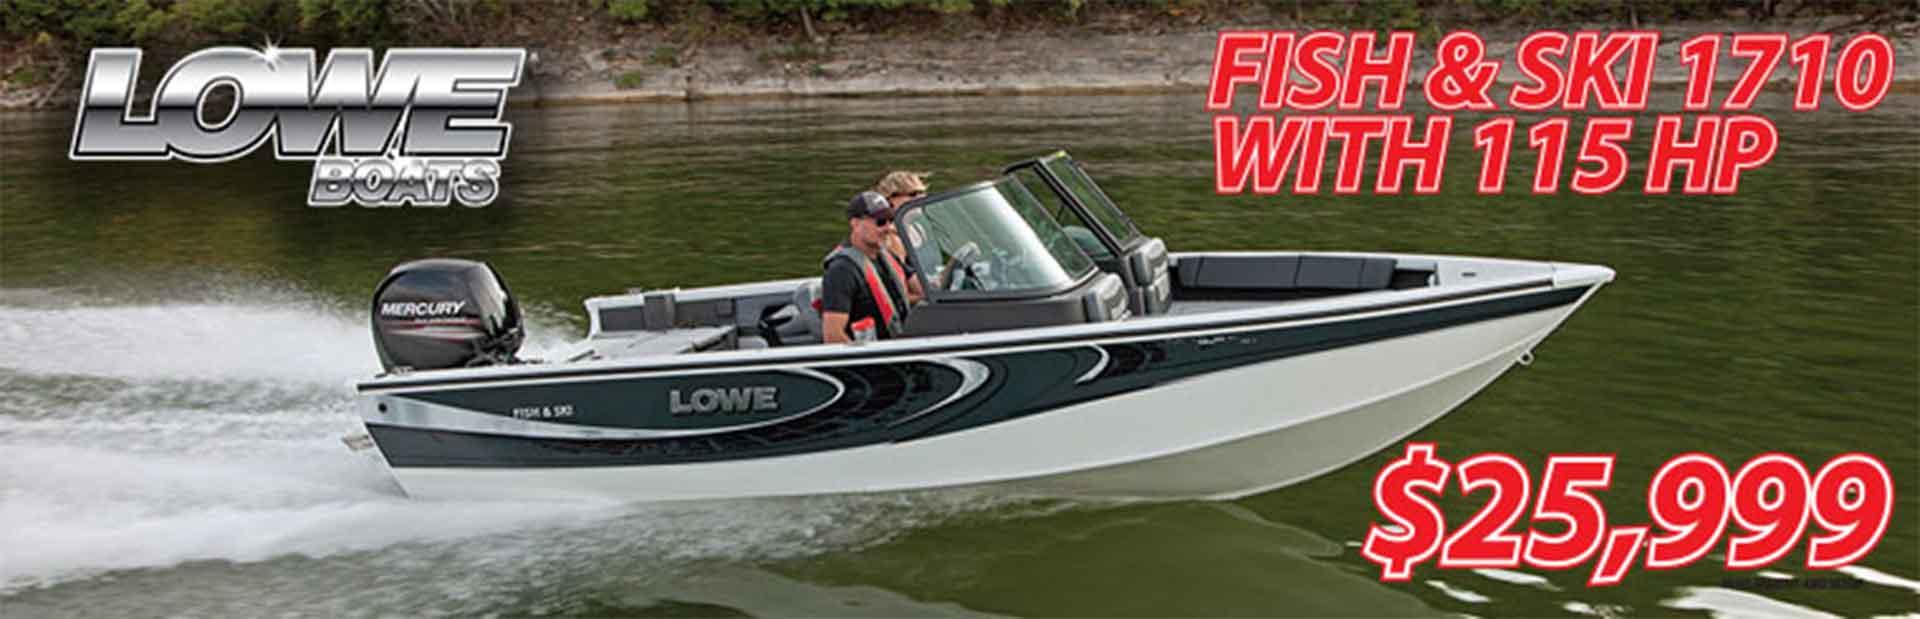 Power Lodge | Brainerd, MN | Powersports, Golf Carts, Boat Dealer